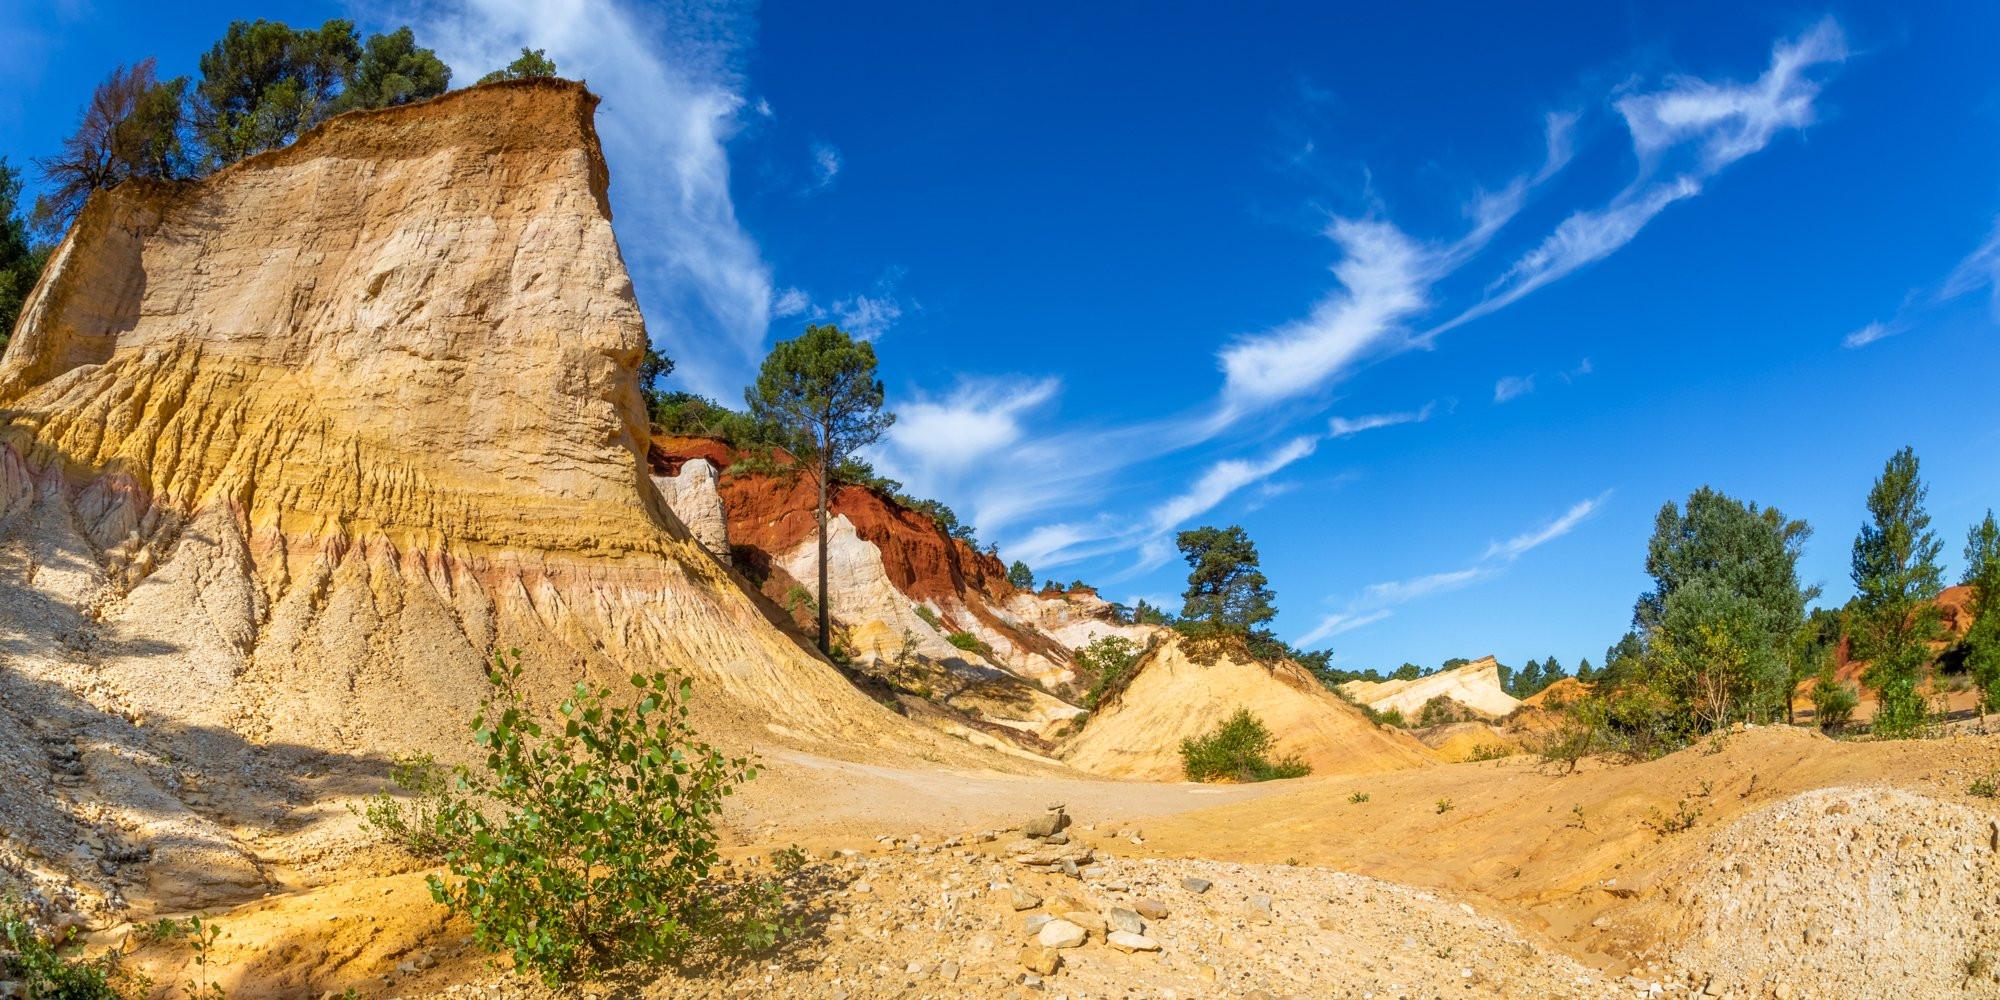 Colorado Provençal landscape in Vaucluse, France